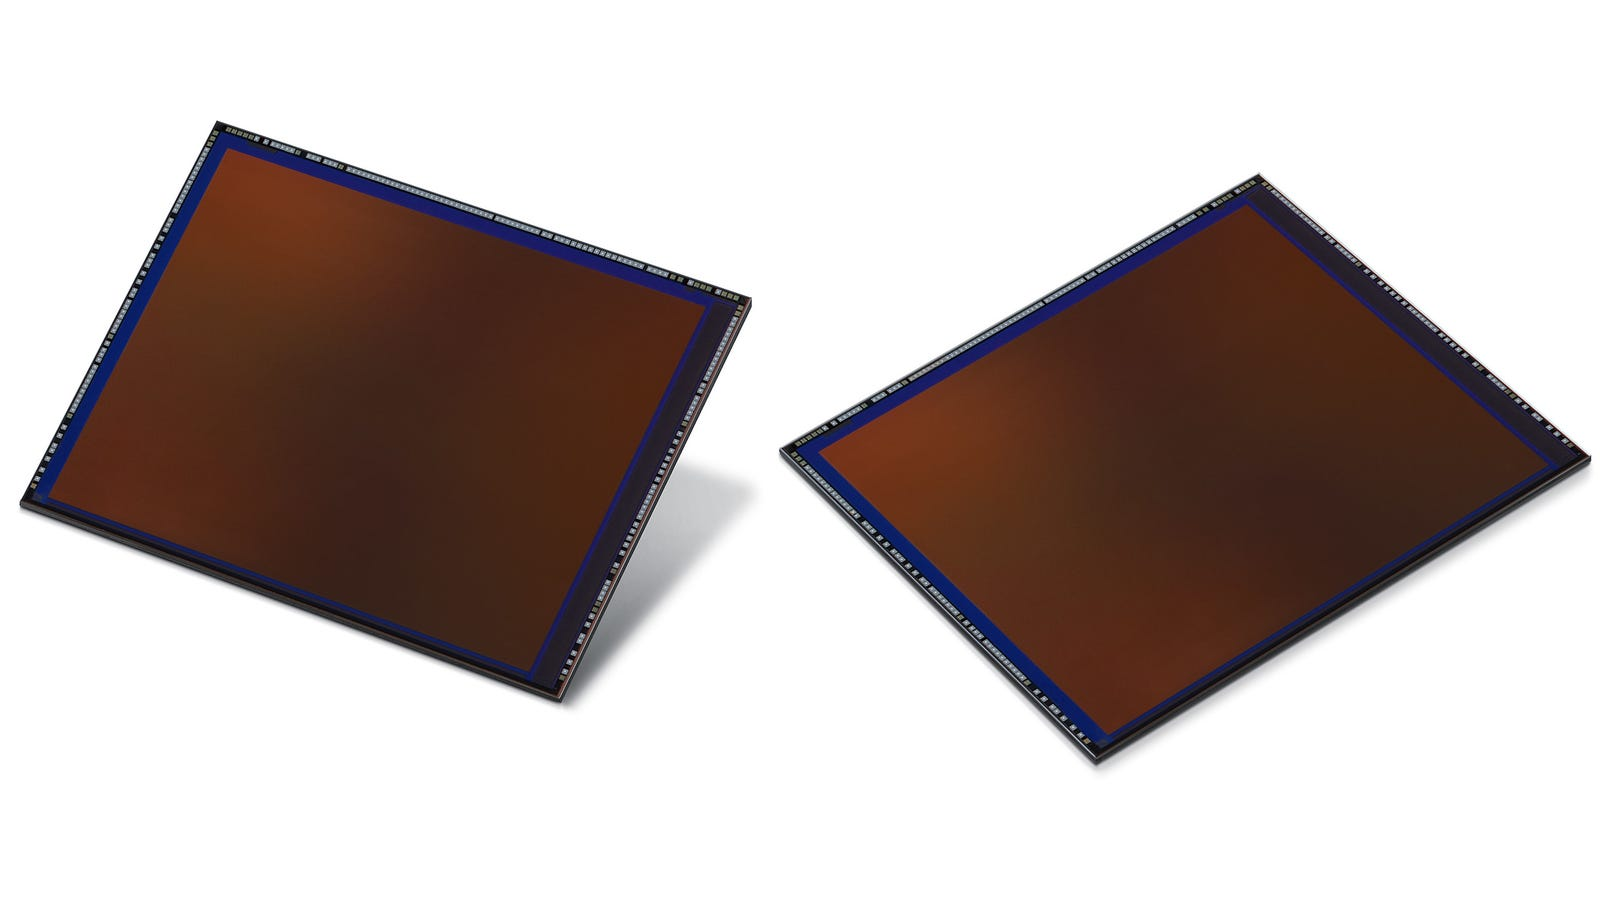 Samsung Reignites Megapixel Wars with 108-MP Sensor for Mobile Photography